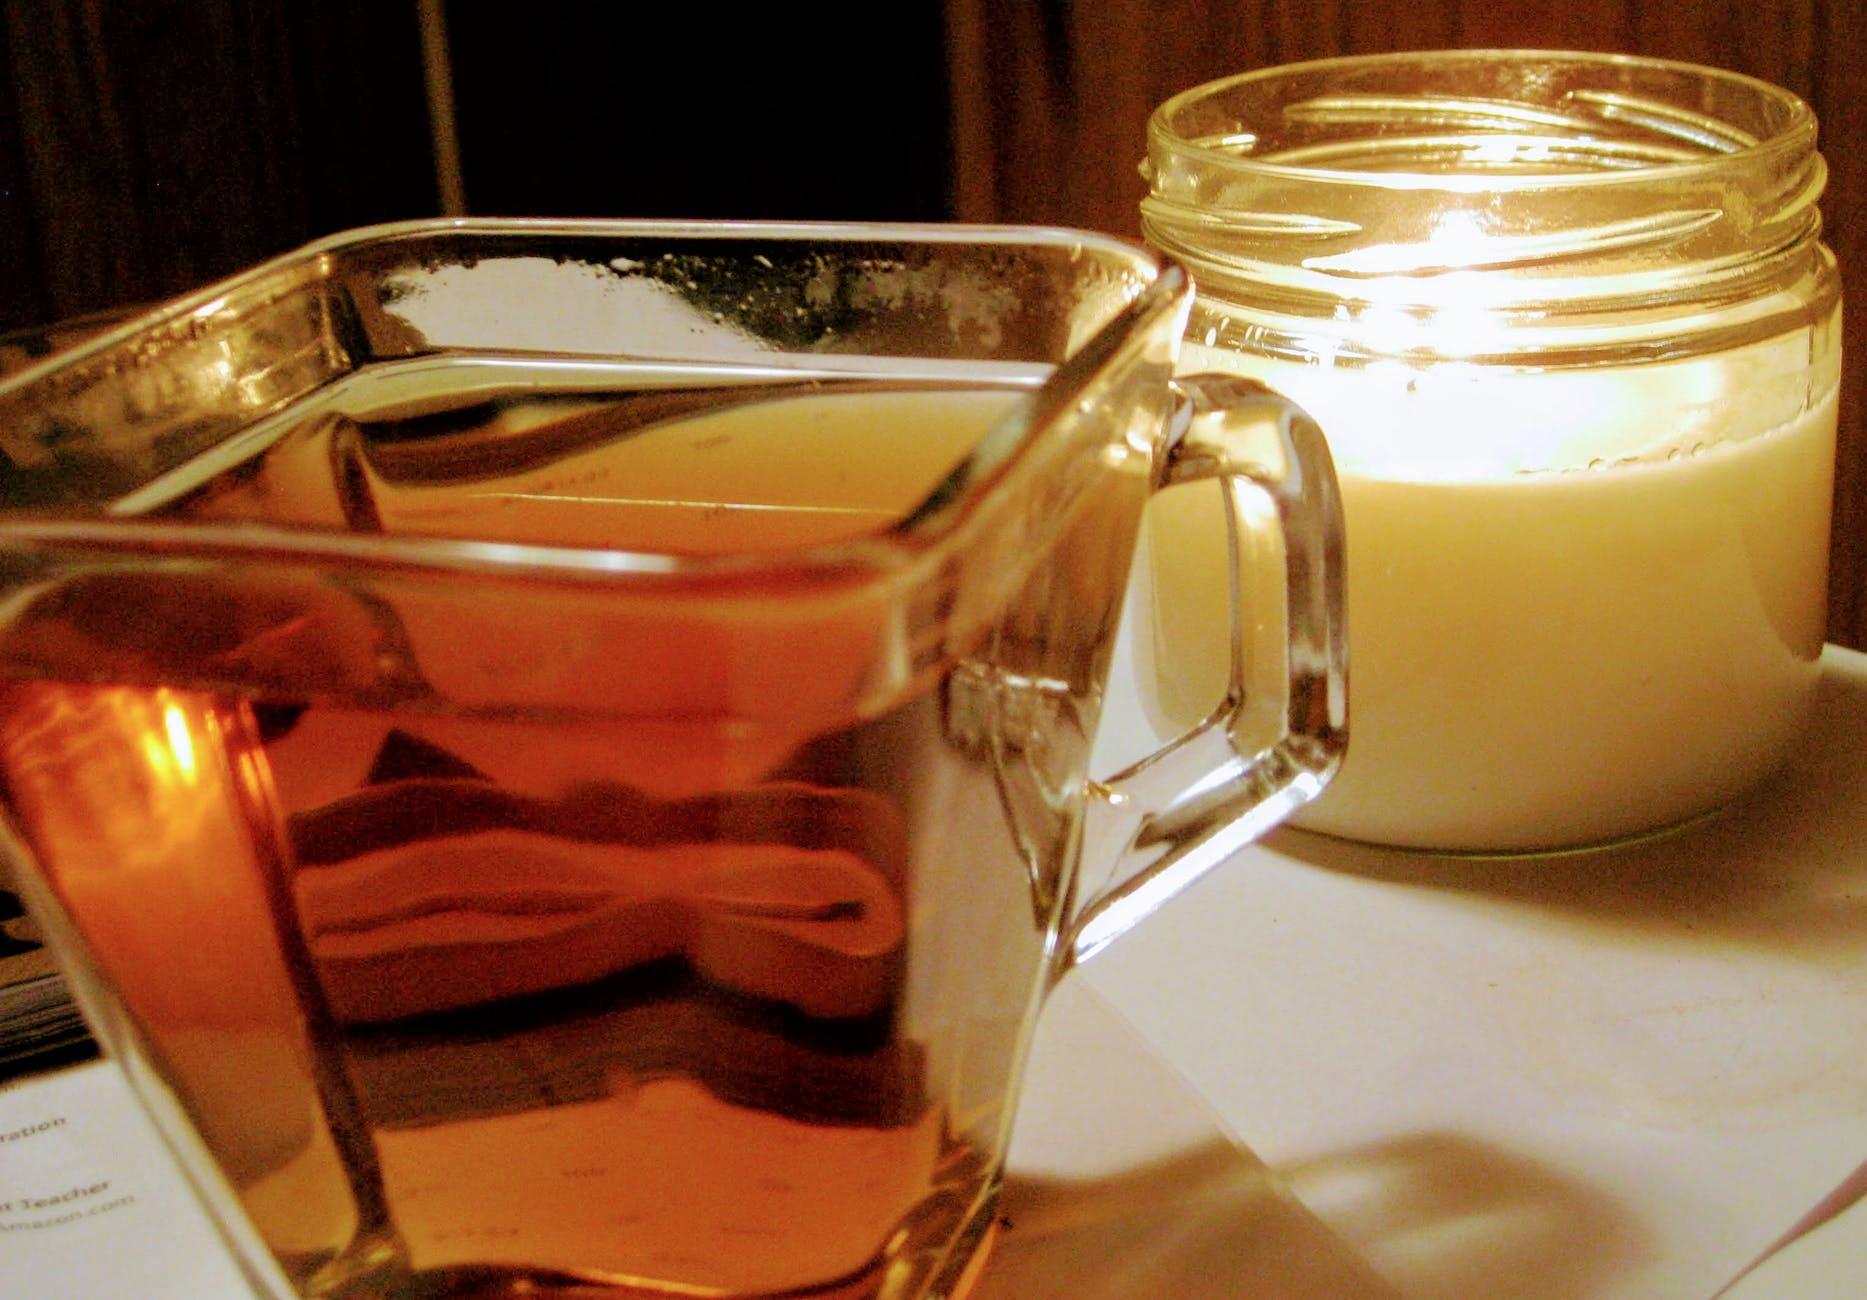 dandelion tea before bed